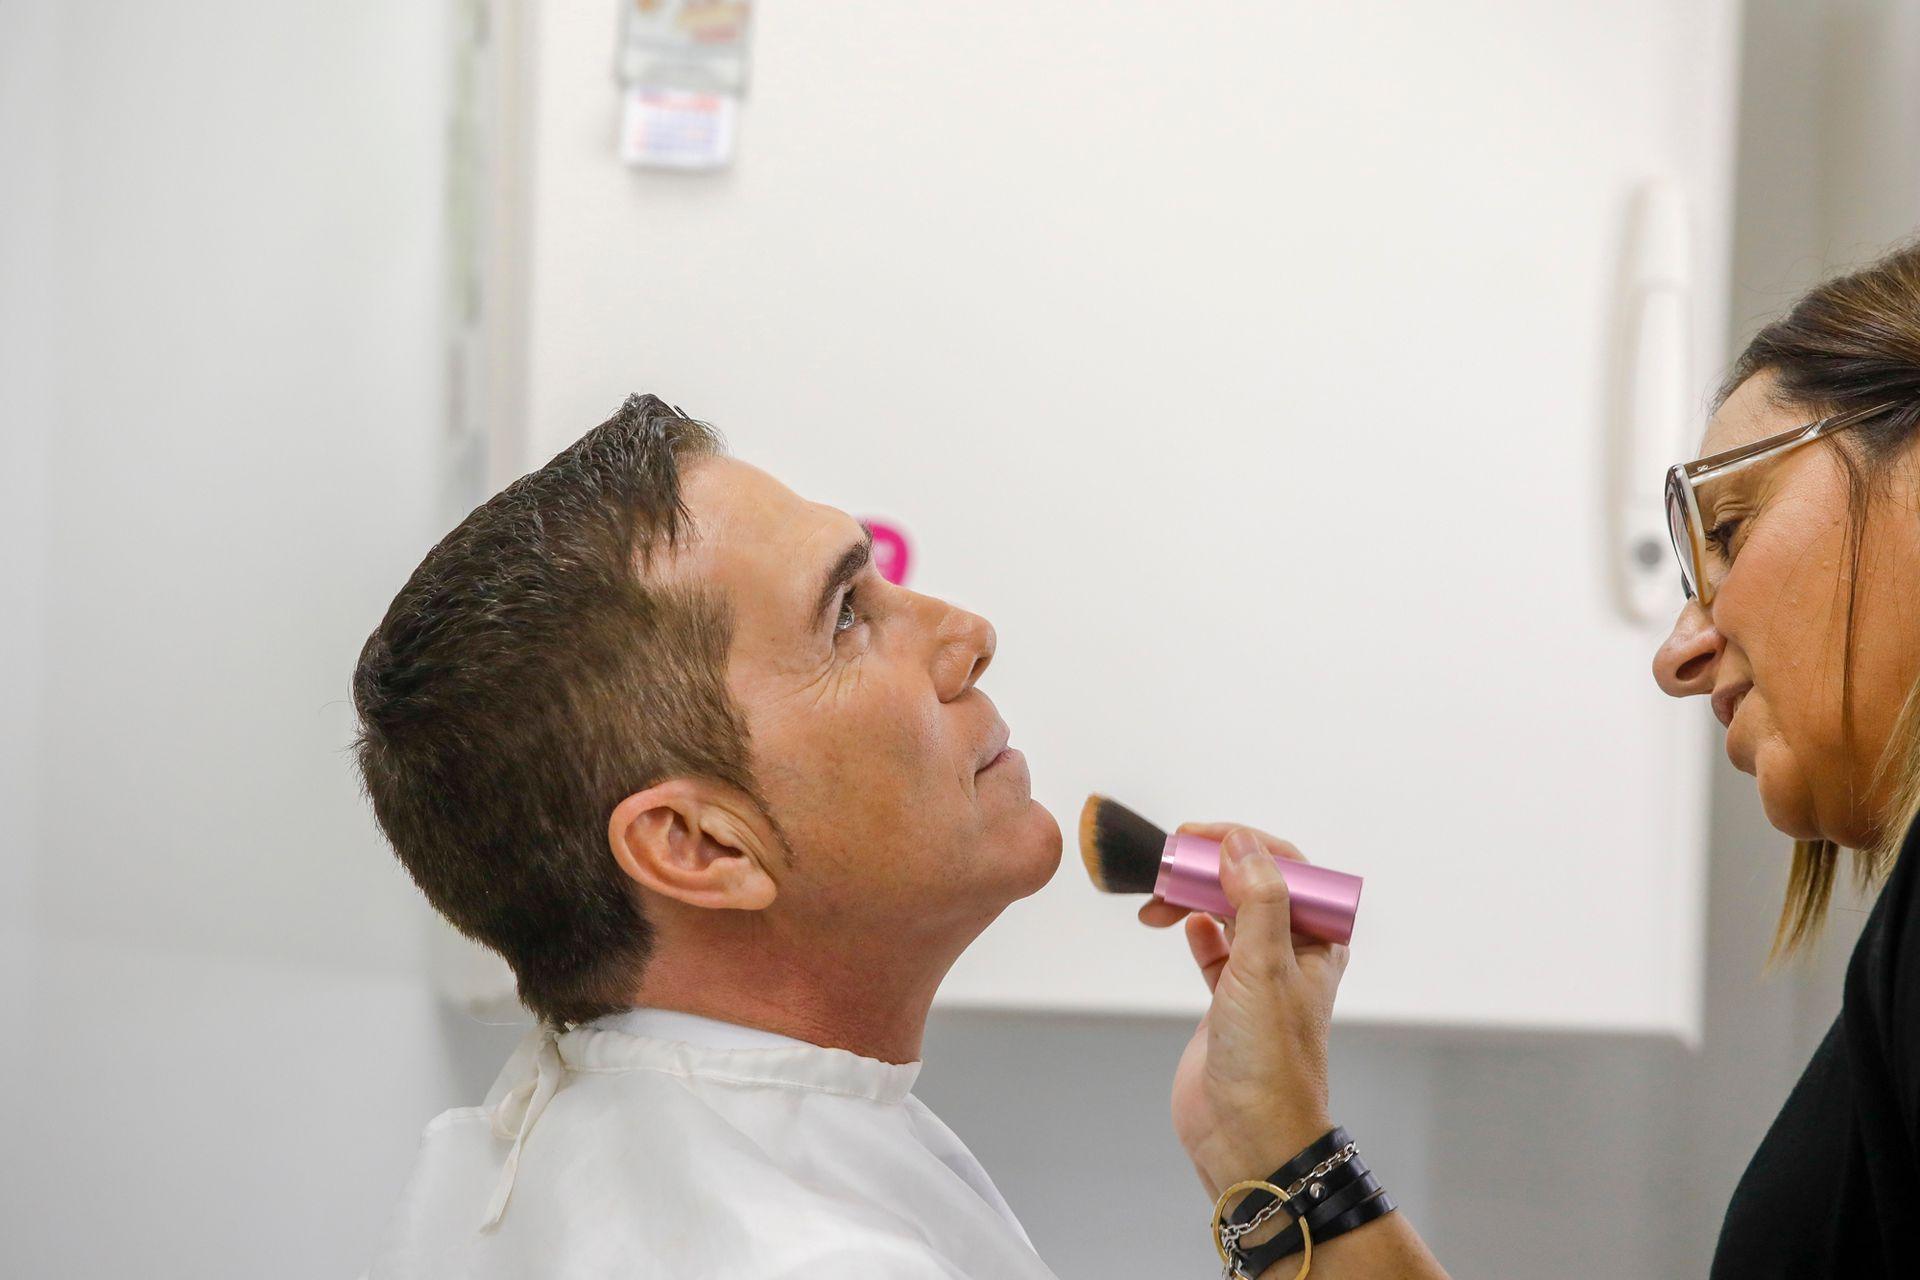 Antes de salir al aire, Barili pasa por la sala de maquillaje